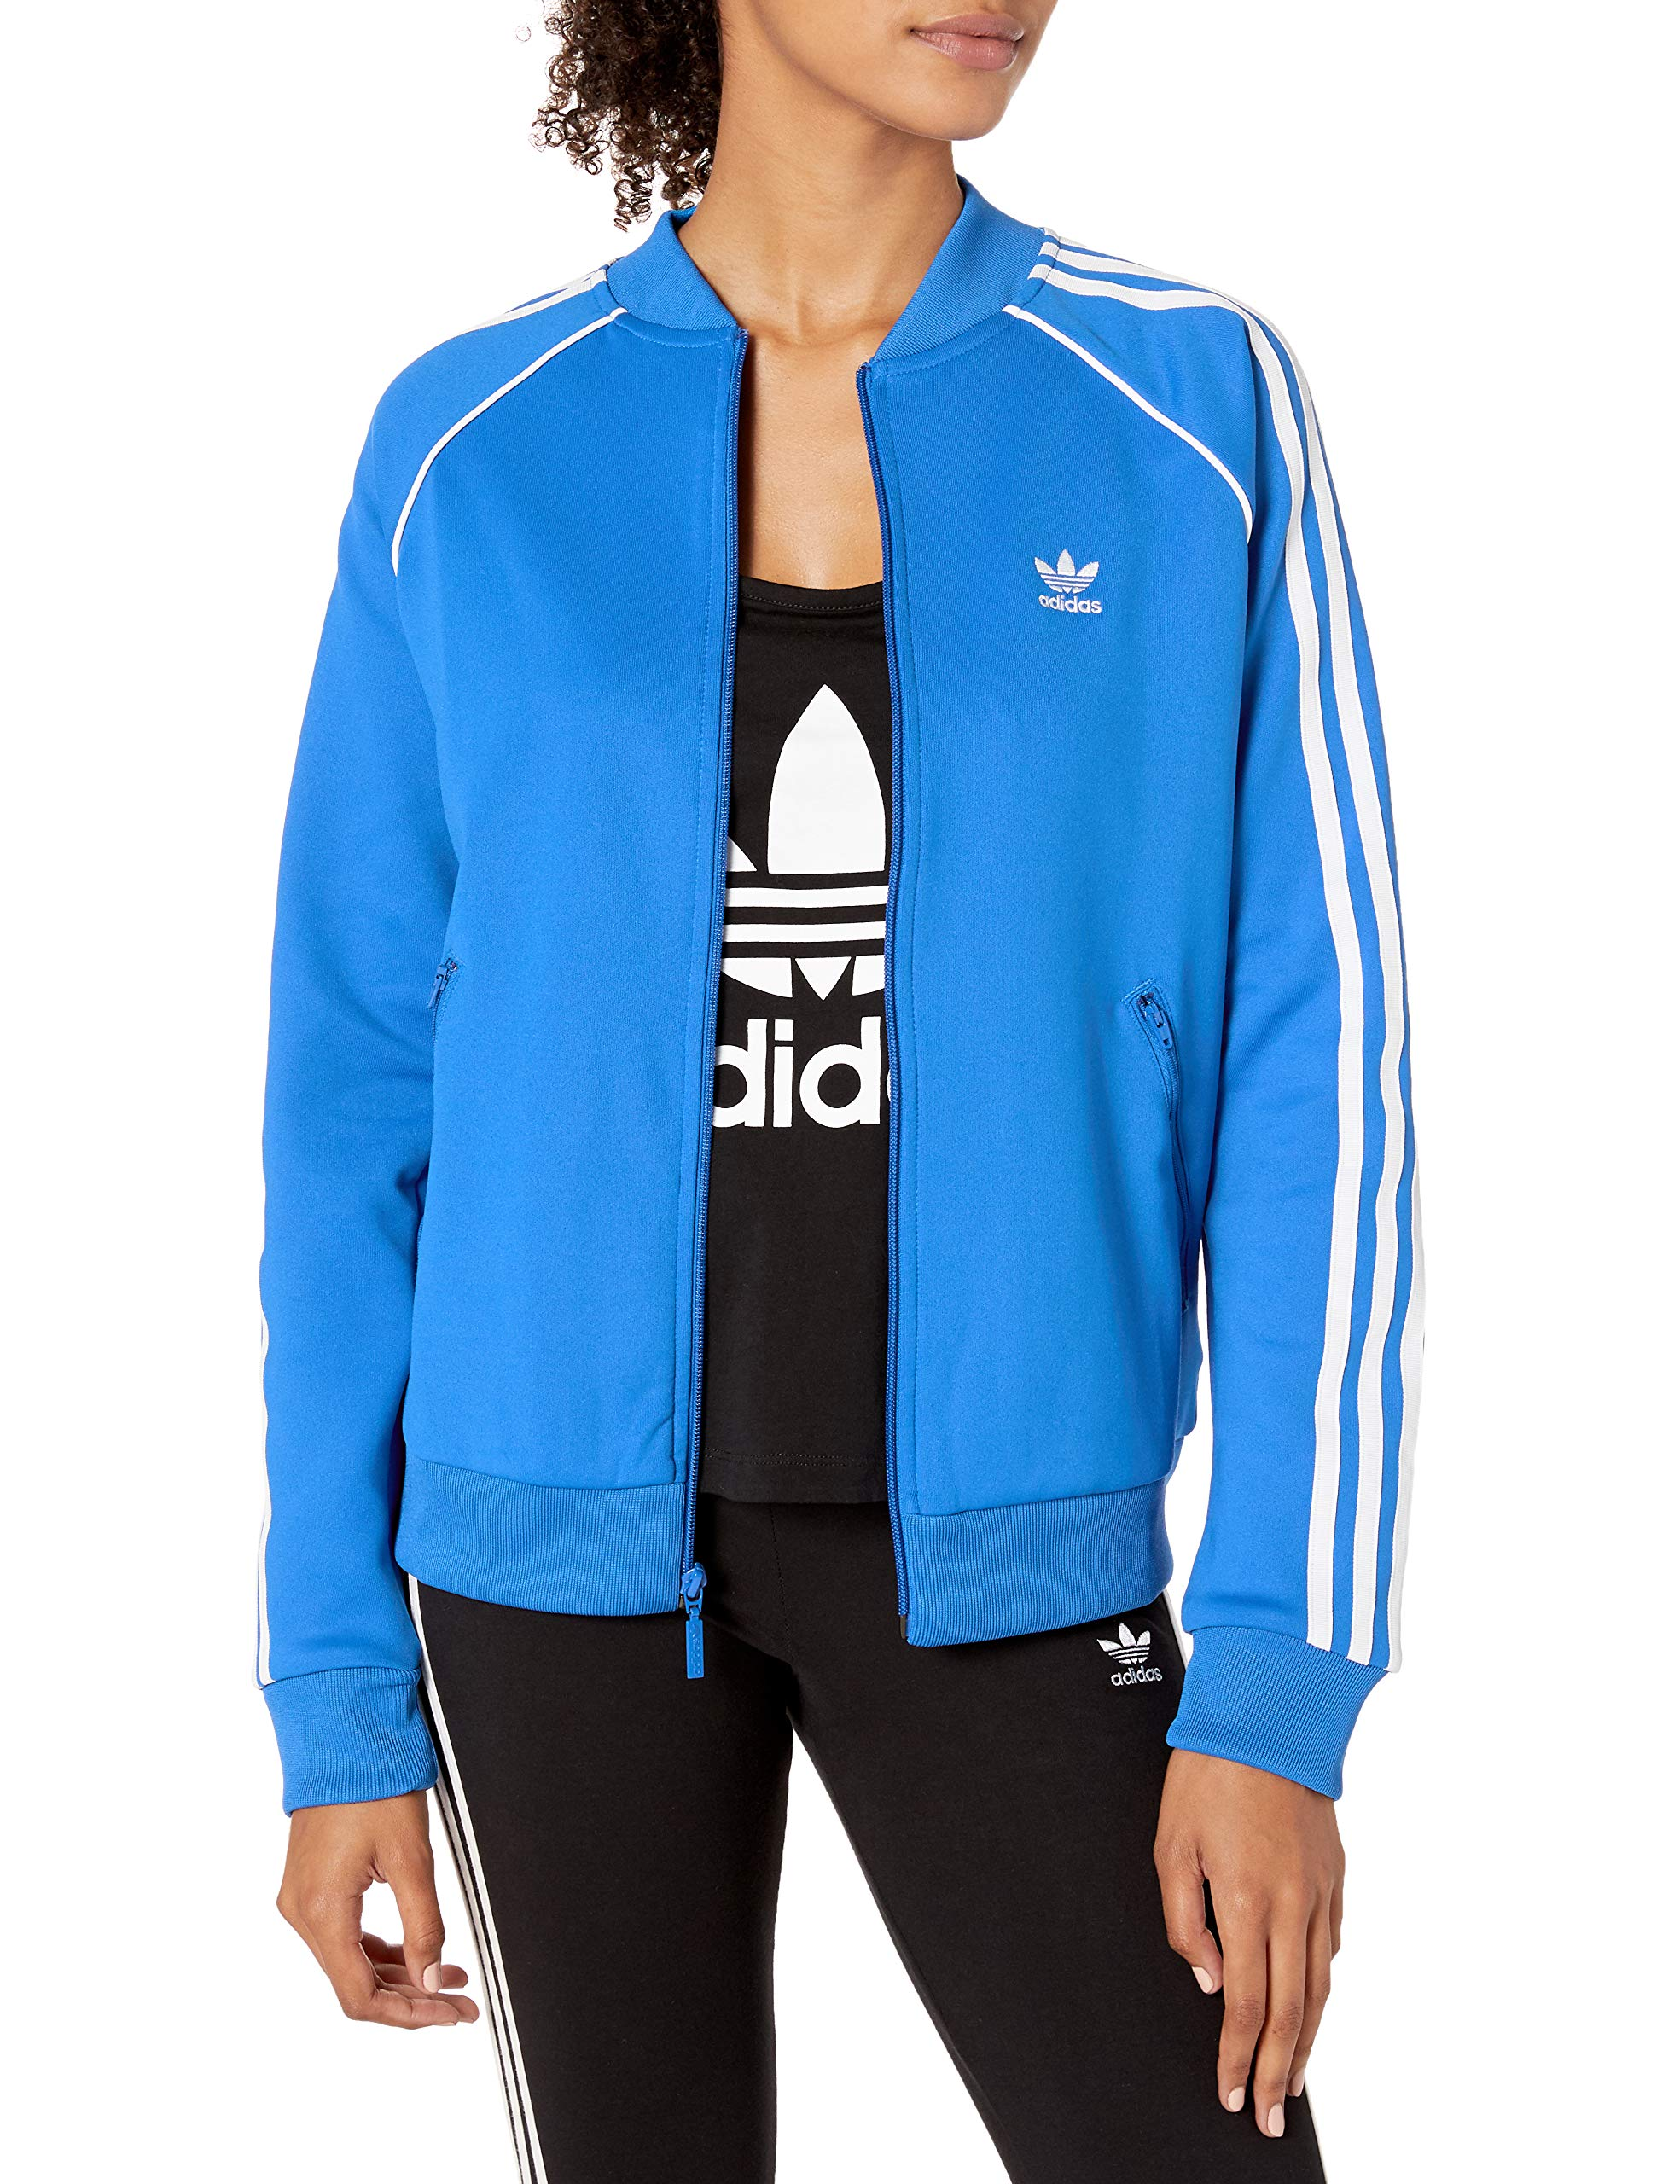 adidas Originals Women's Superstar Track Top Jacket, Blue Bird, Small by adidas Originals